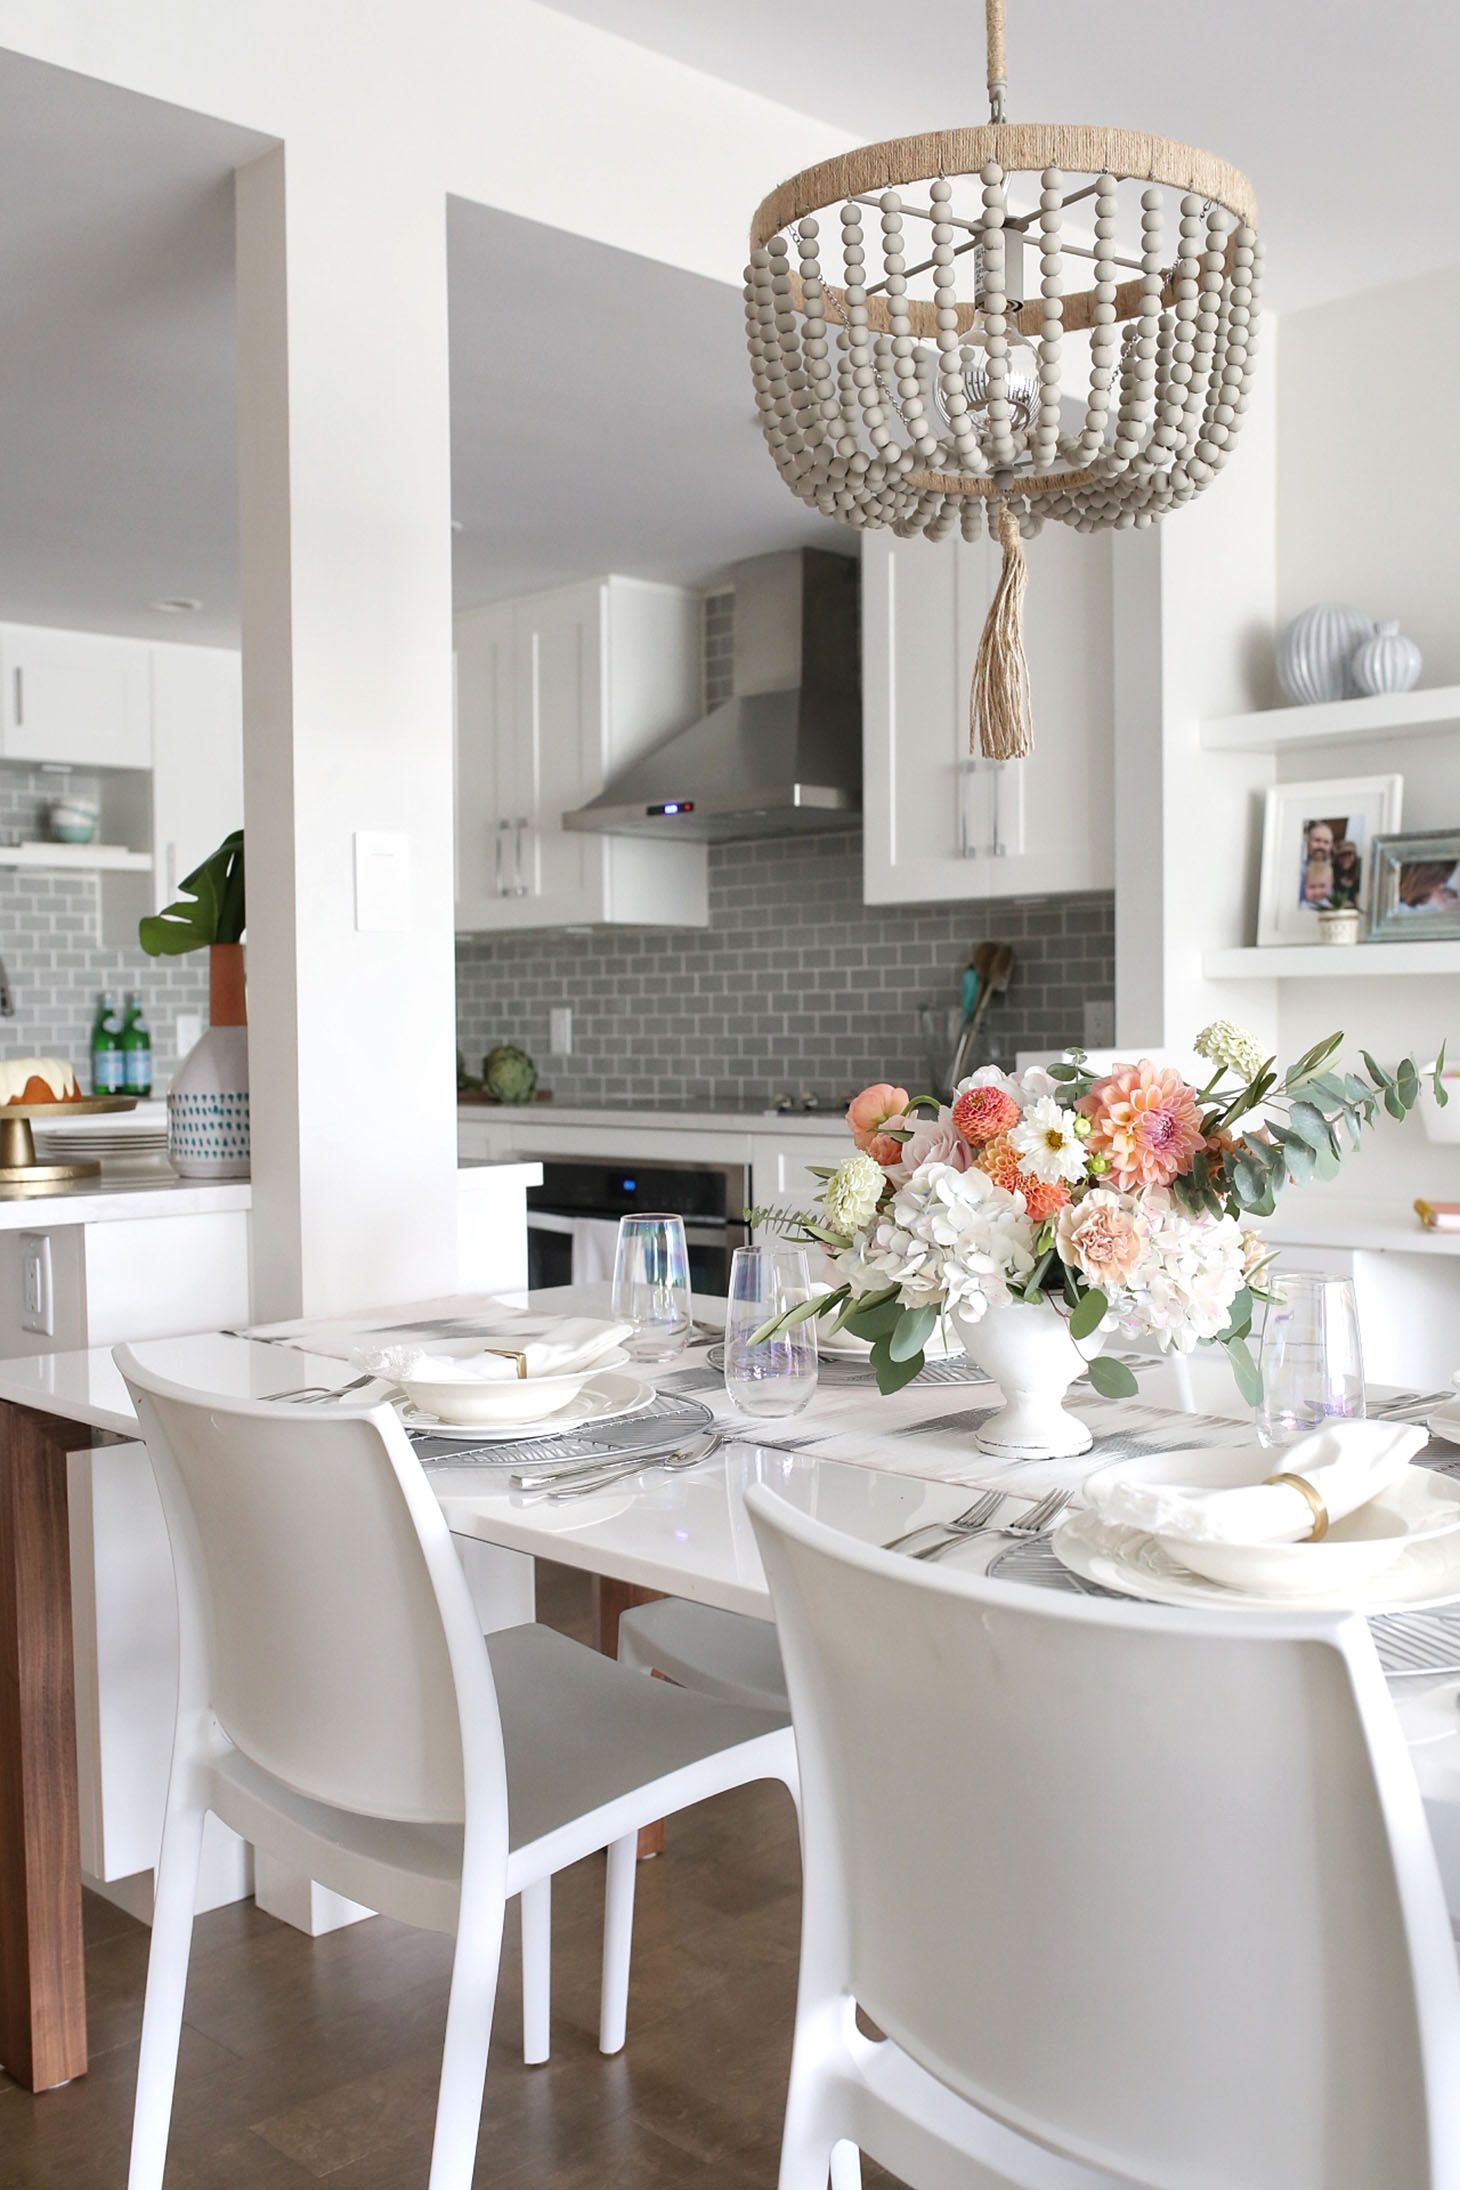 Jillian harris sam home reveal kitchen home decor pinterest